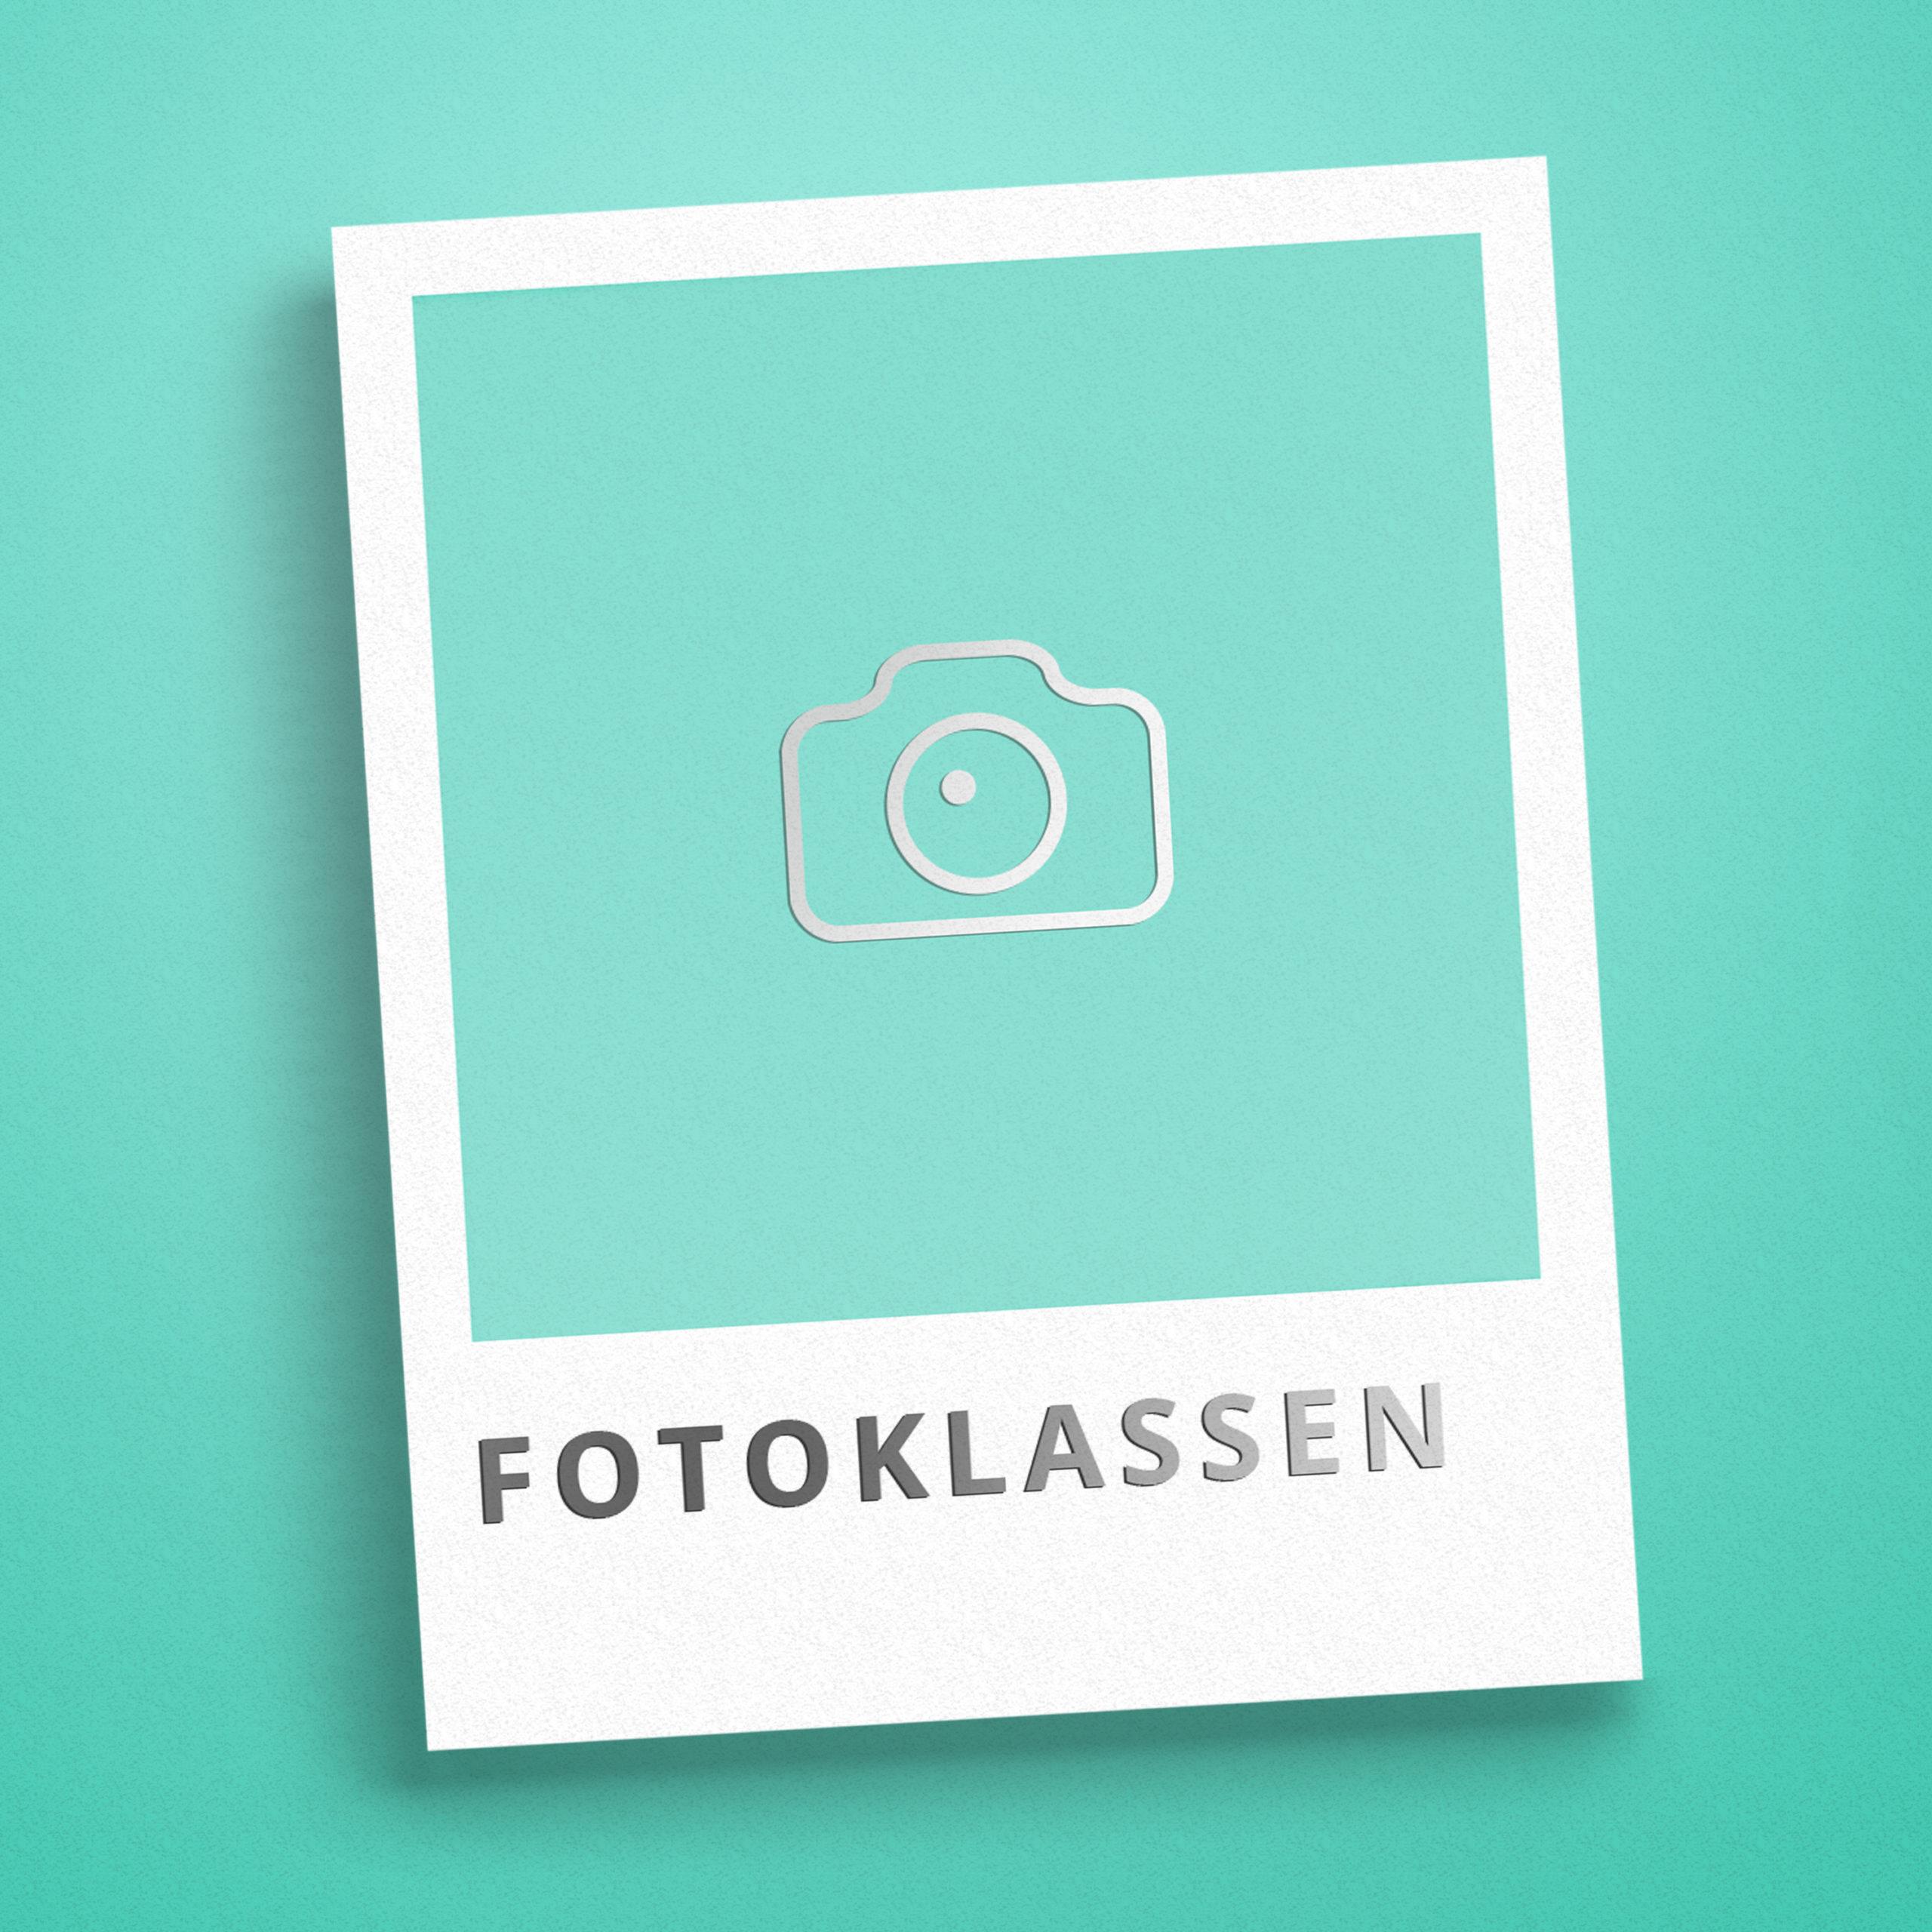 Fotoklassen